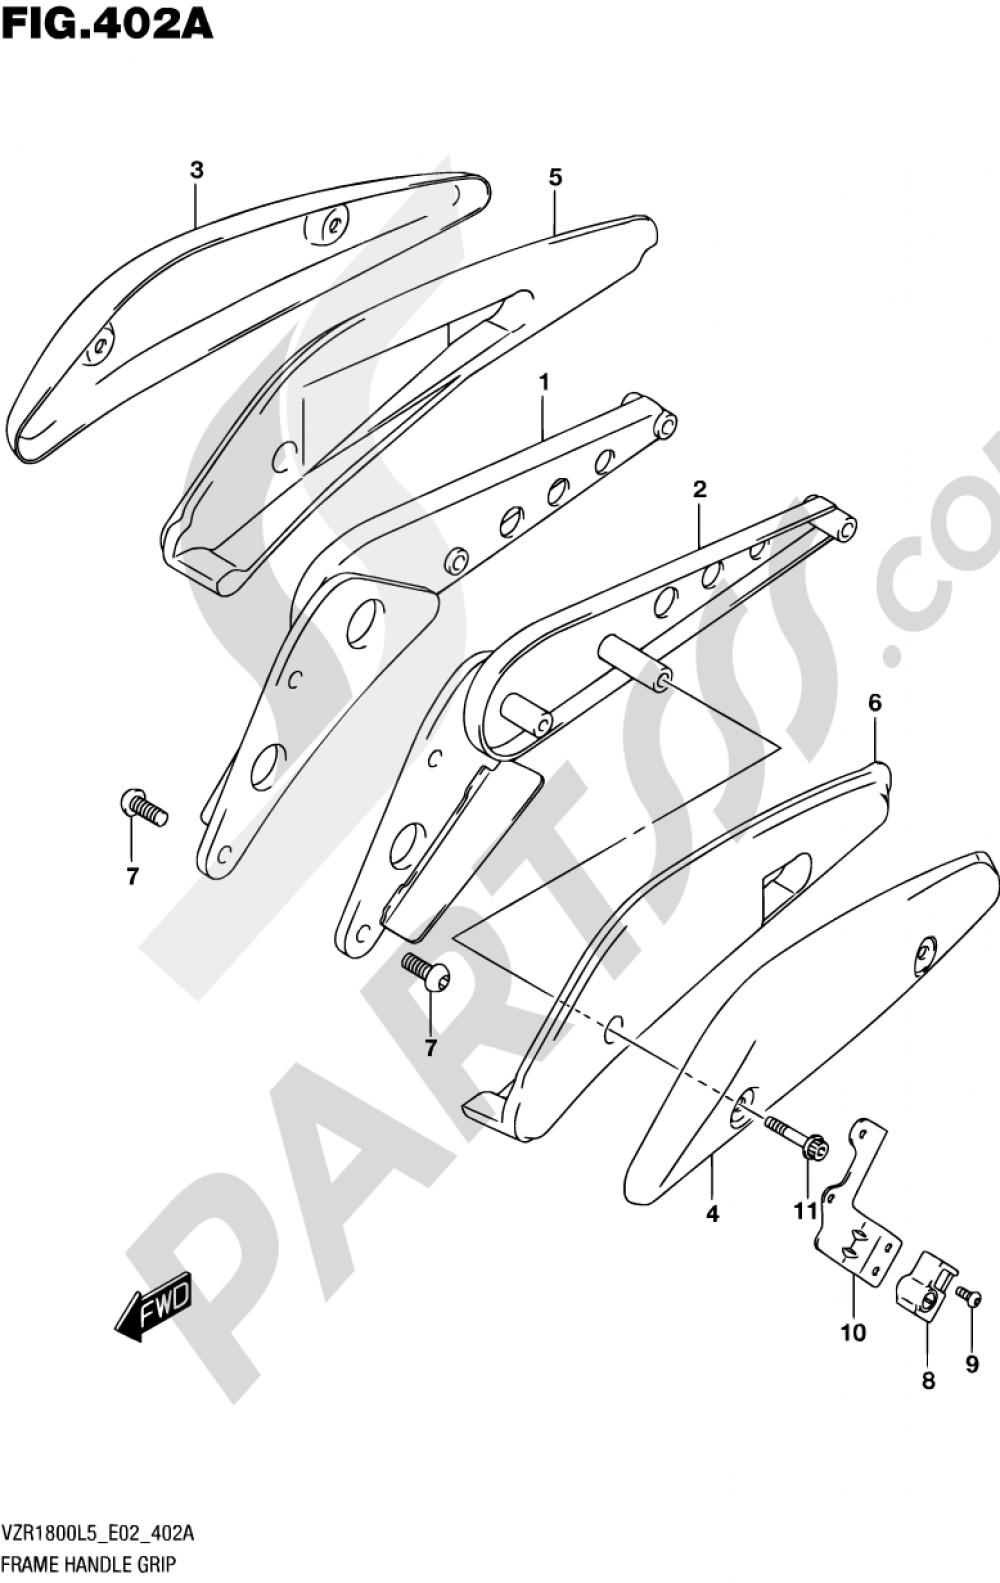 402A - FRAME HANDLE GRIP (VZR1800L5 E02) Suzuki VZR1800 2015